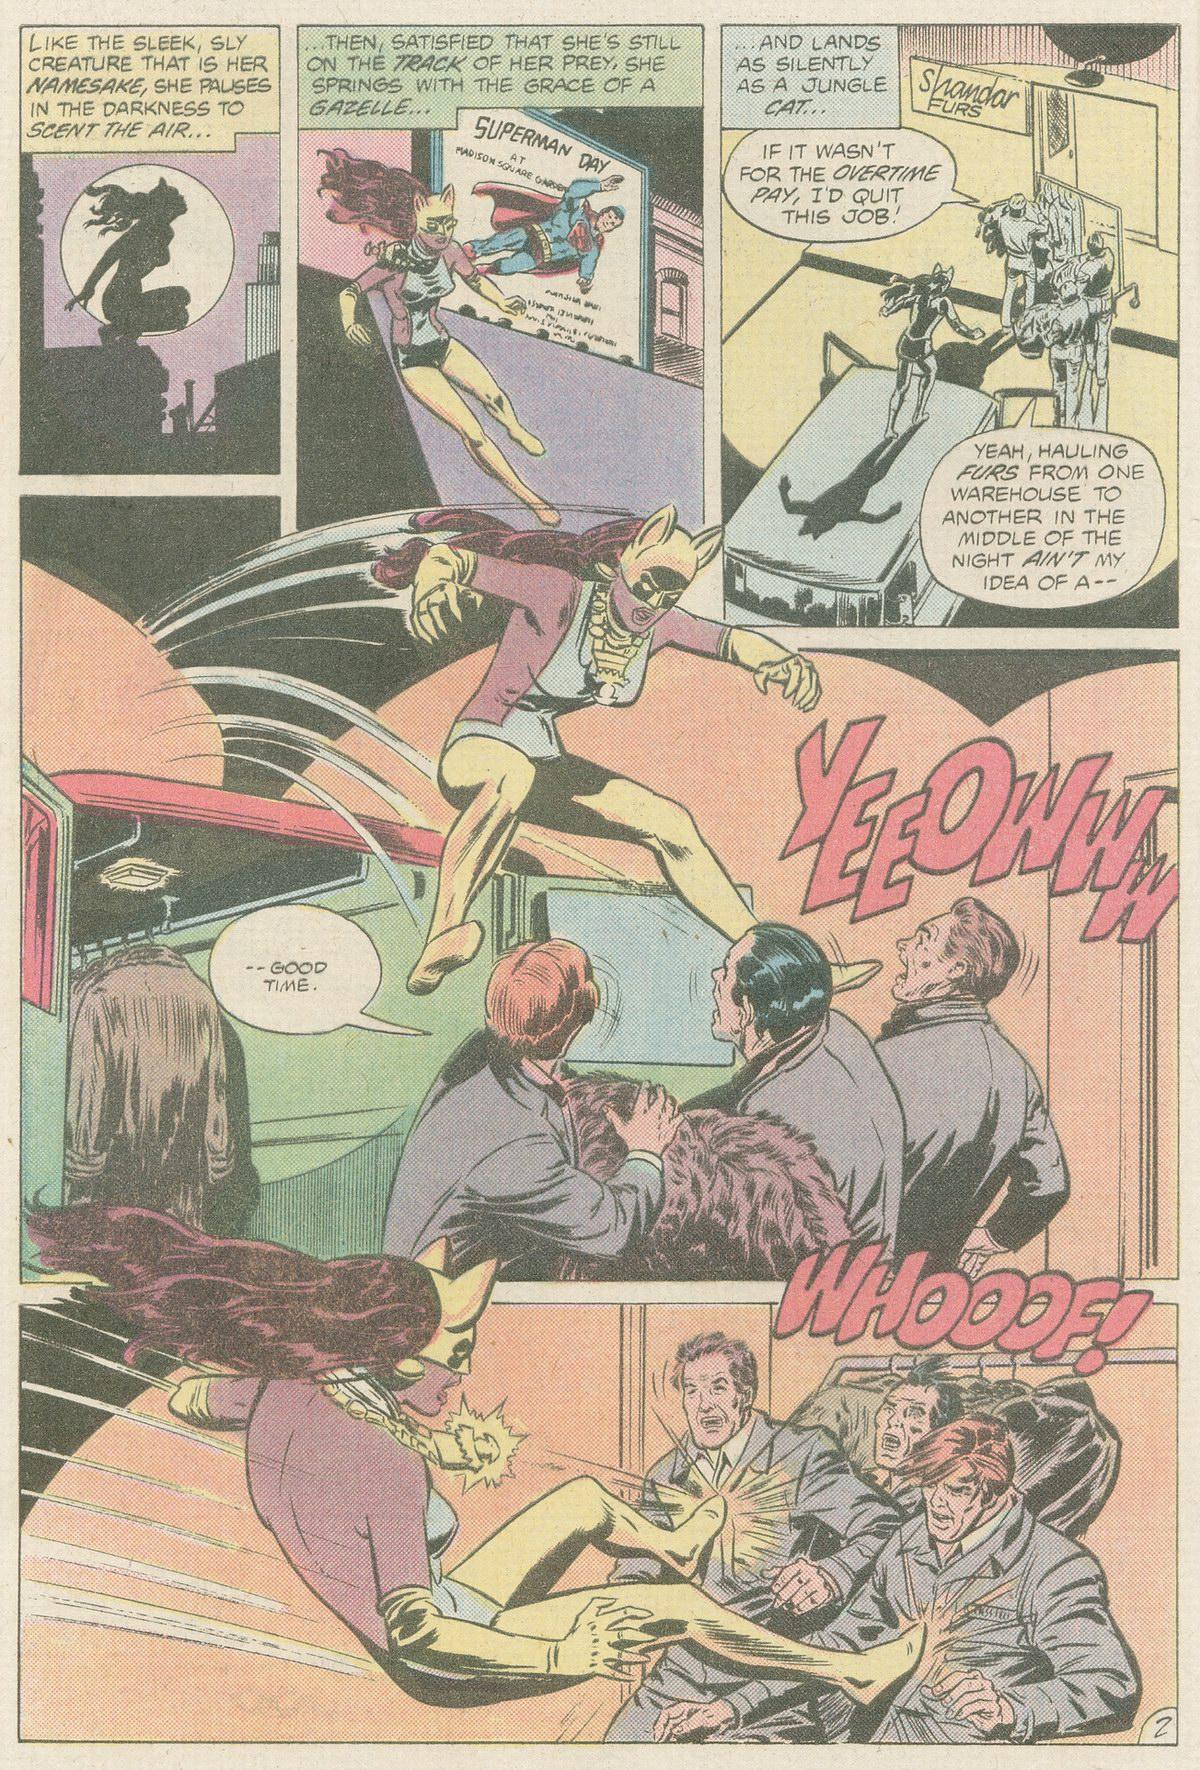 Action Comics (1938) 521 Page 2